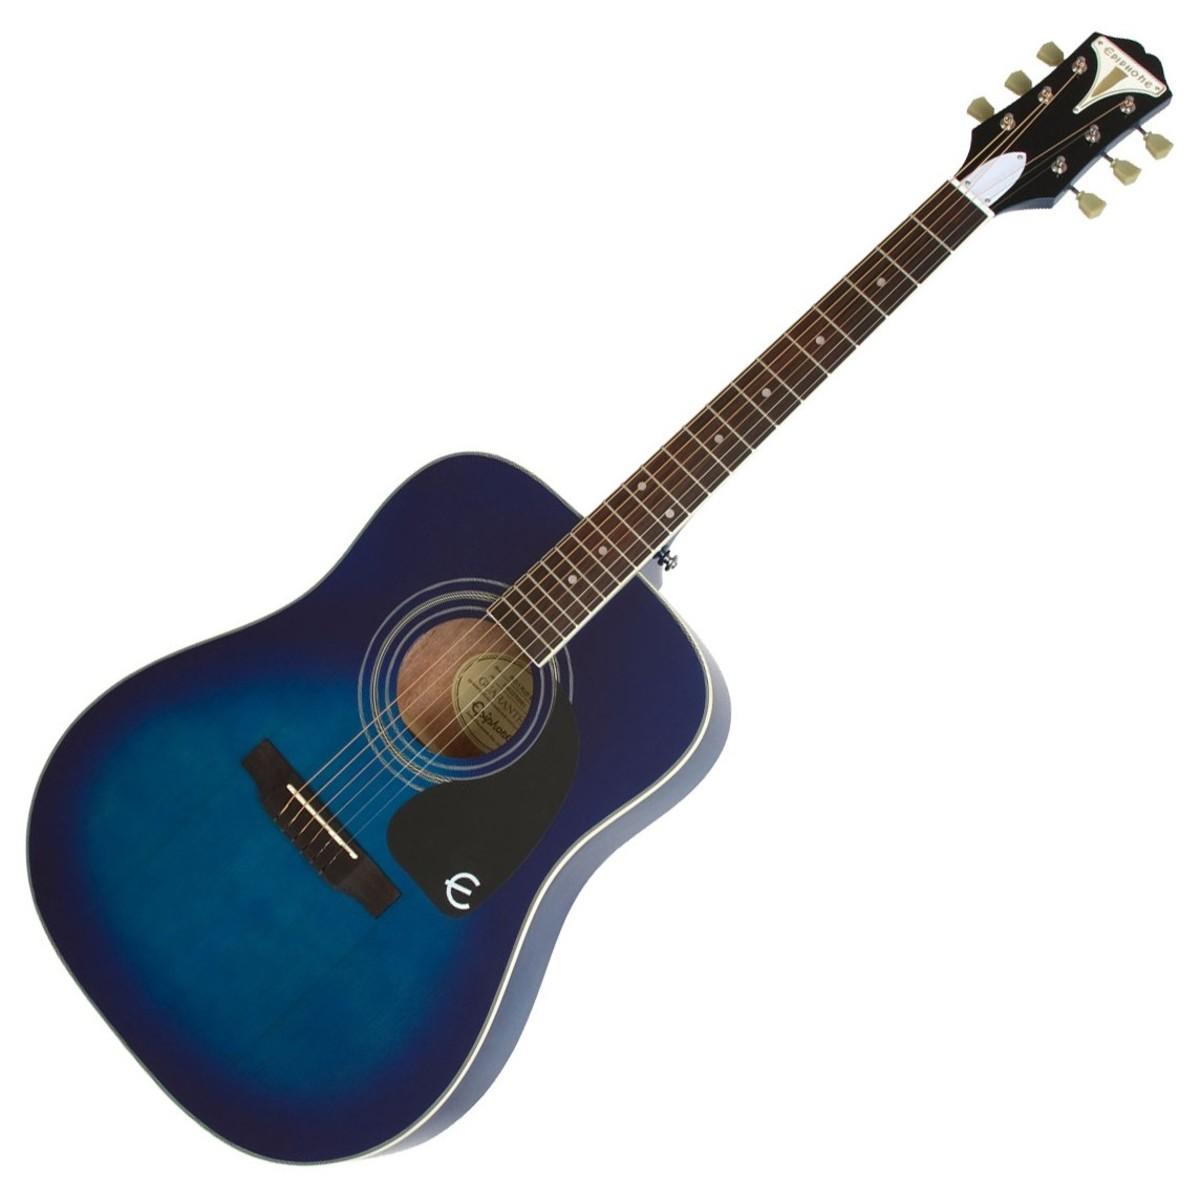 epiphone pro 1 plus acoustic trans blue at gear4music. Black Bedroom Furniture Sets. Home Design Ideas